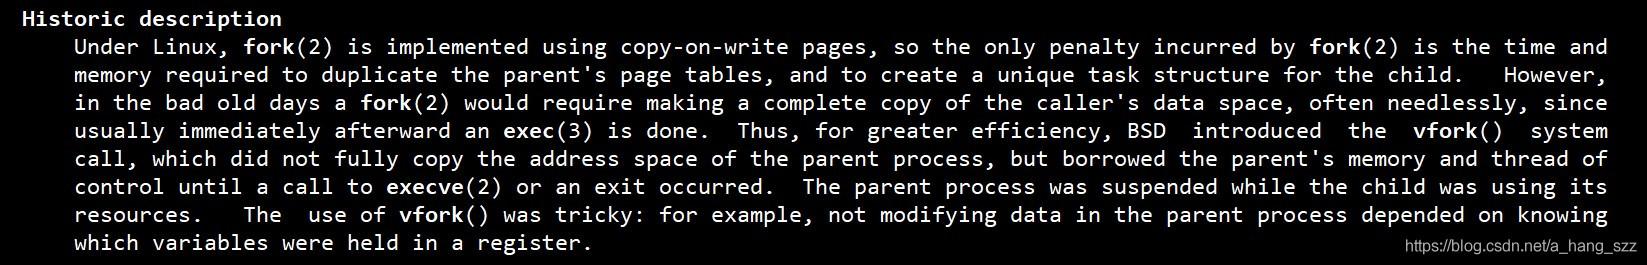 man文档描述